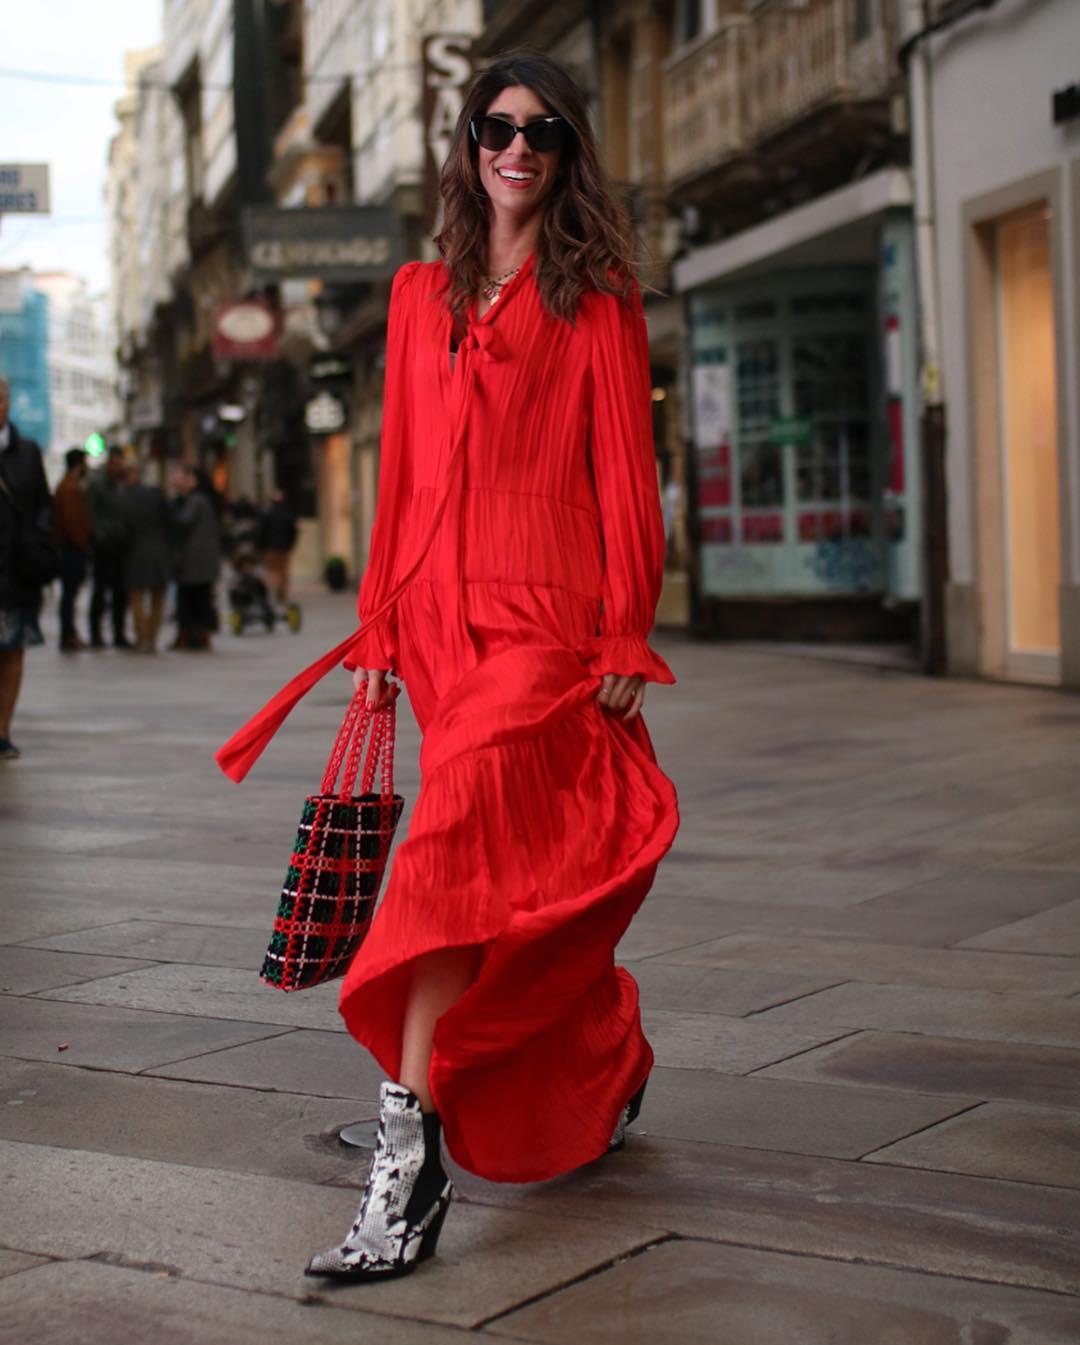 dress with ruffles de Zara sur maarttaan